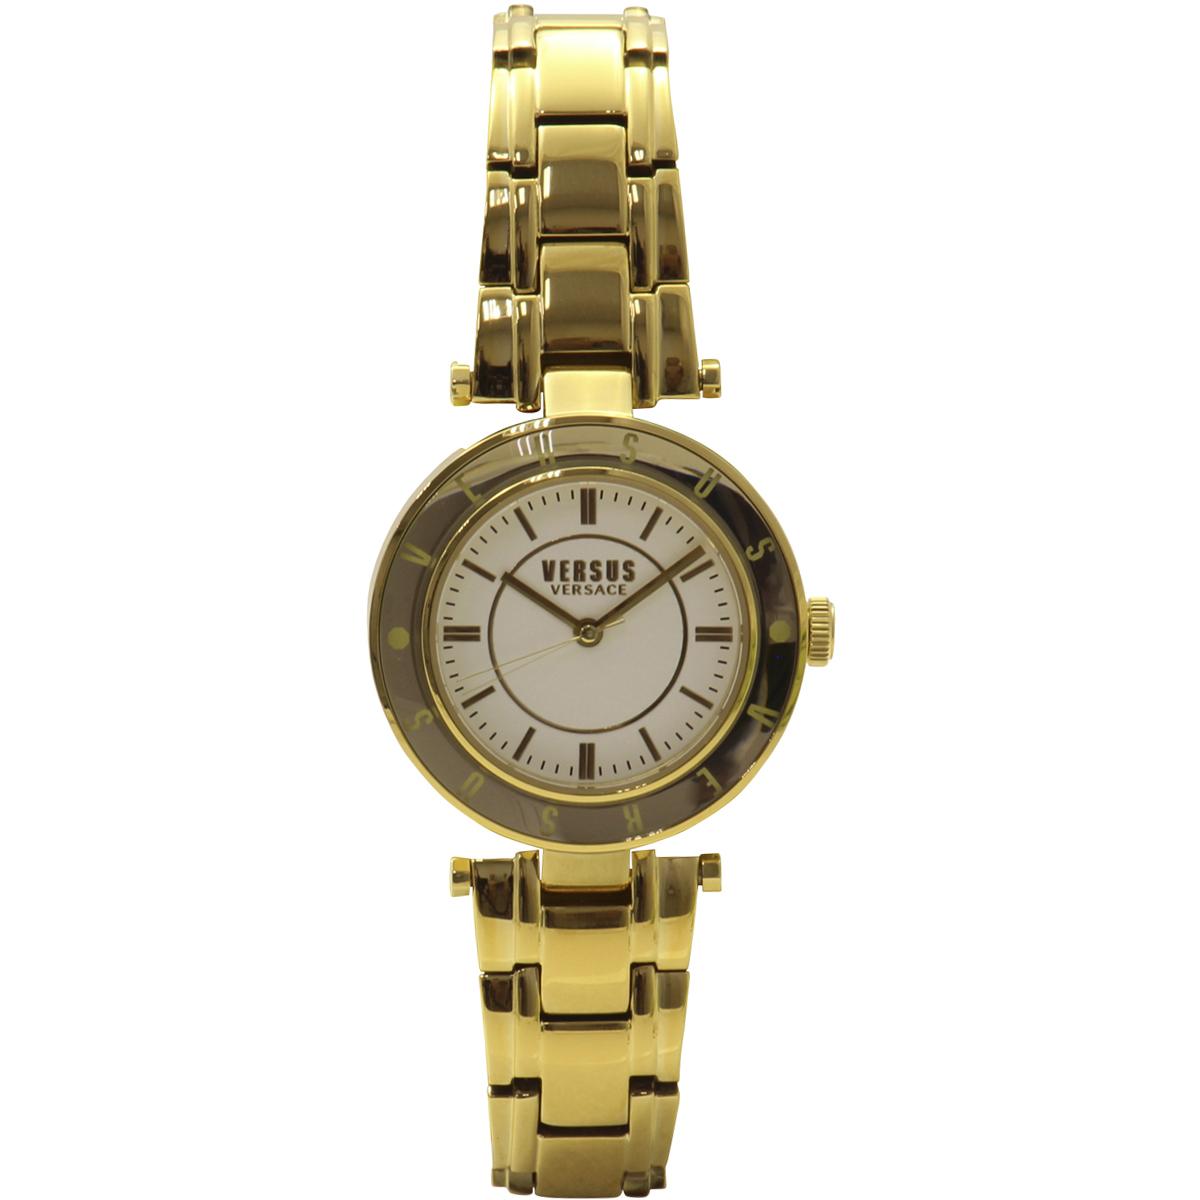 Versus By Versace Women's SP8200015 Yellow Gold/White Analog Watch